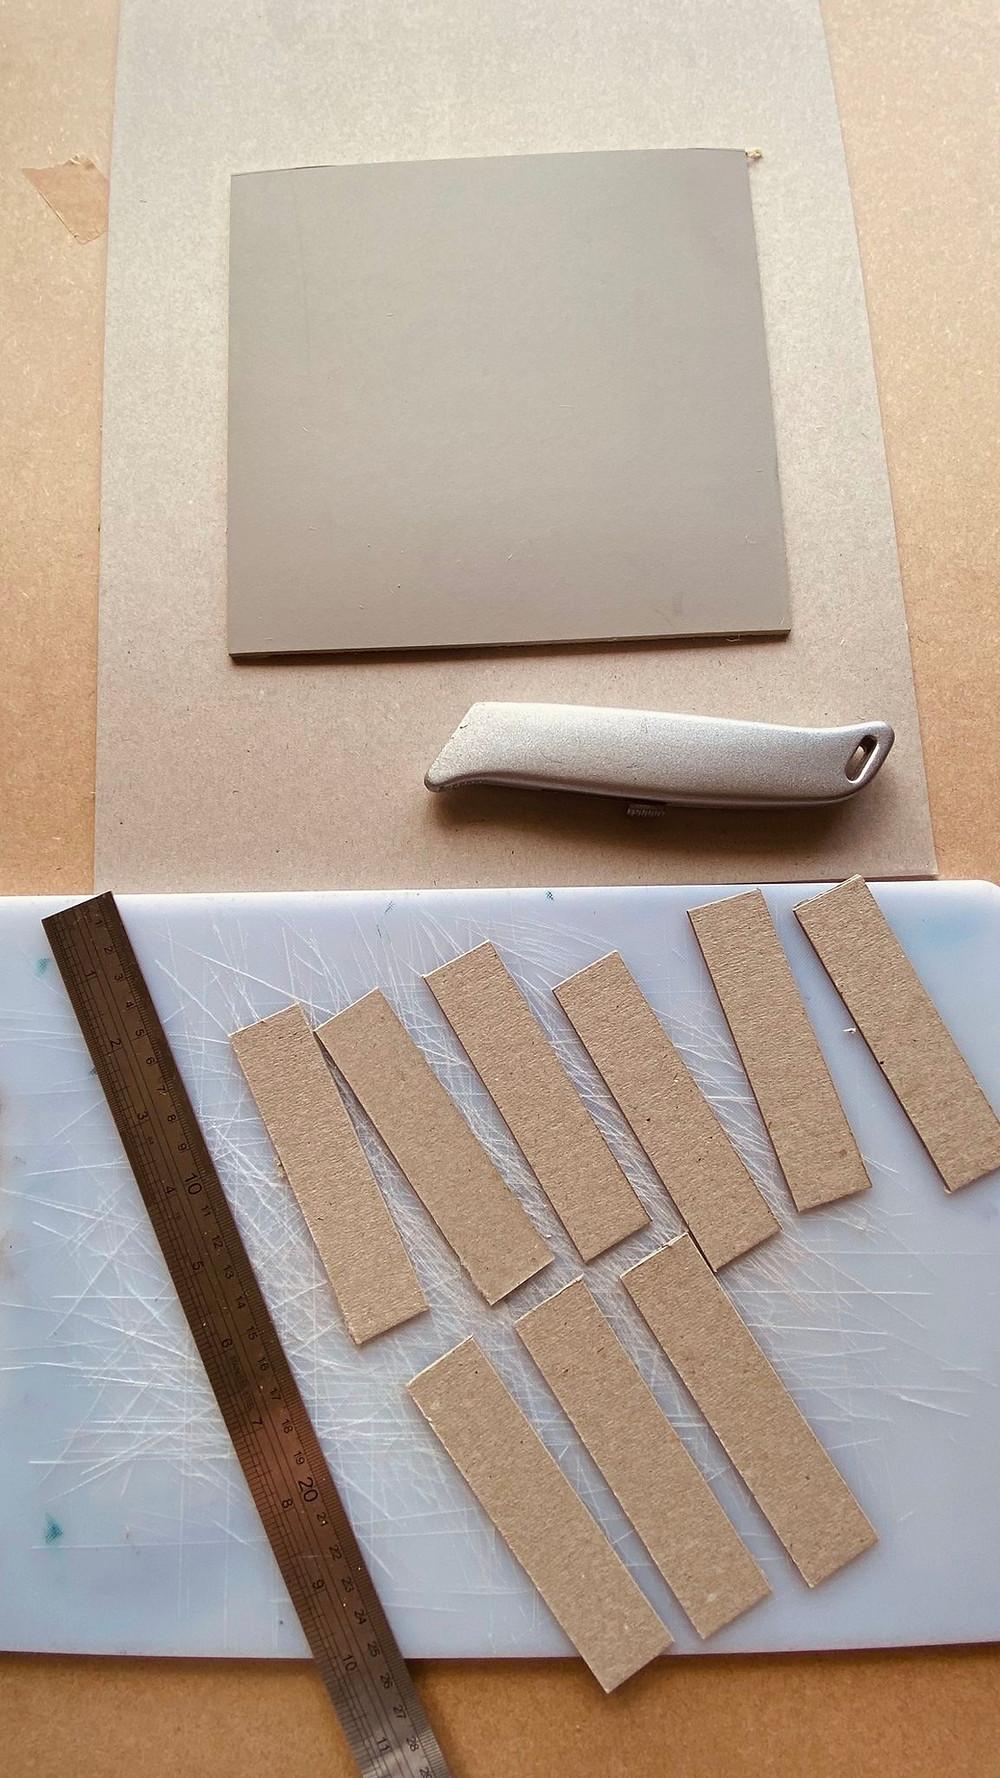 Cutting cardboard to make linocut registration board